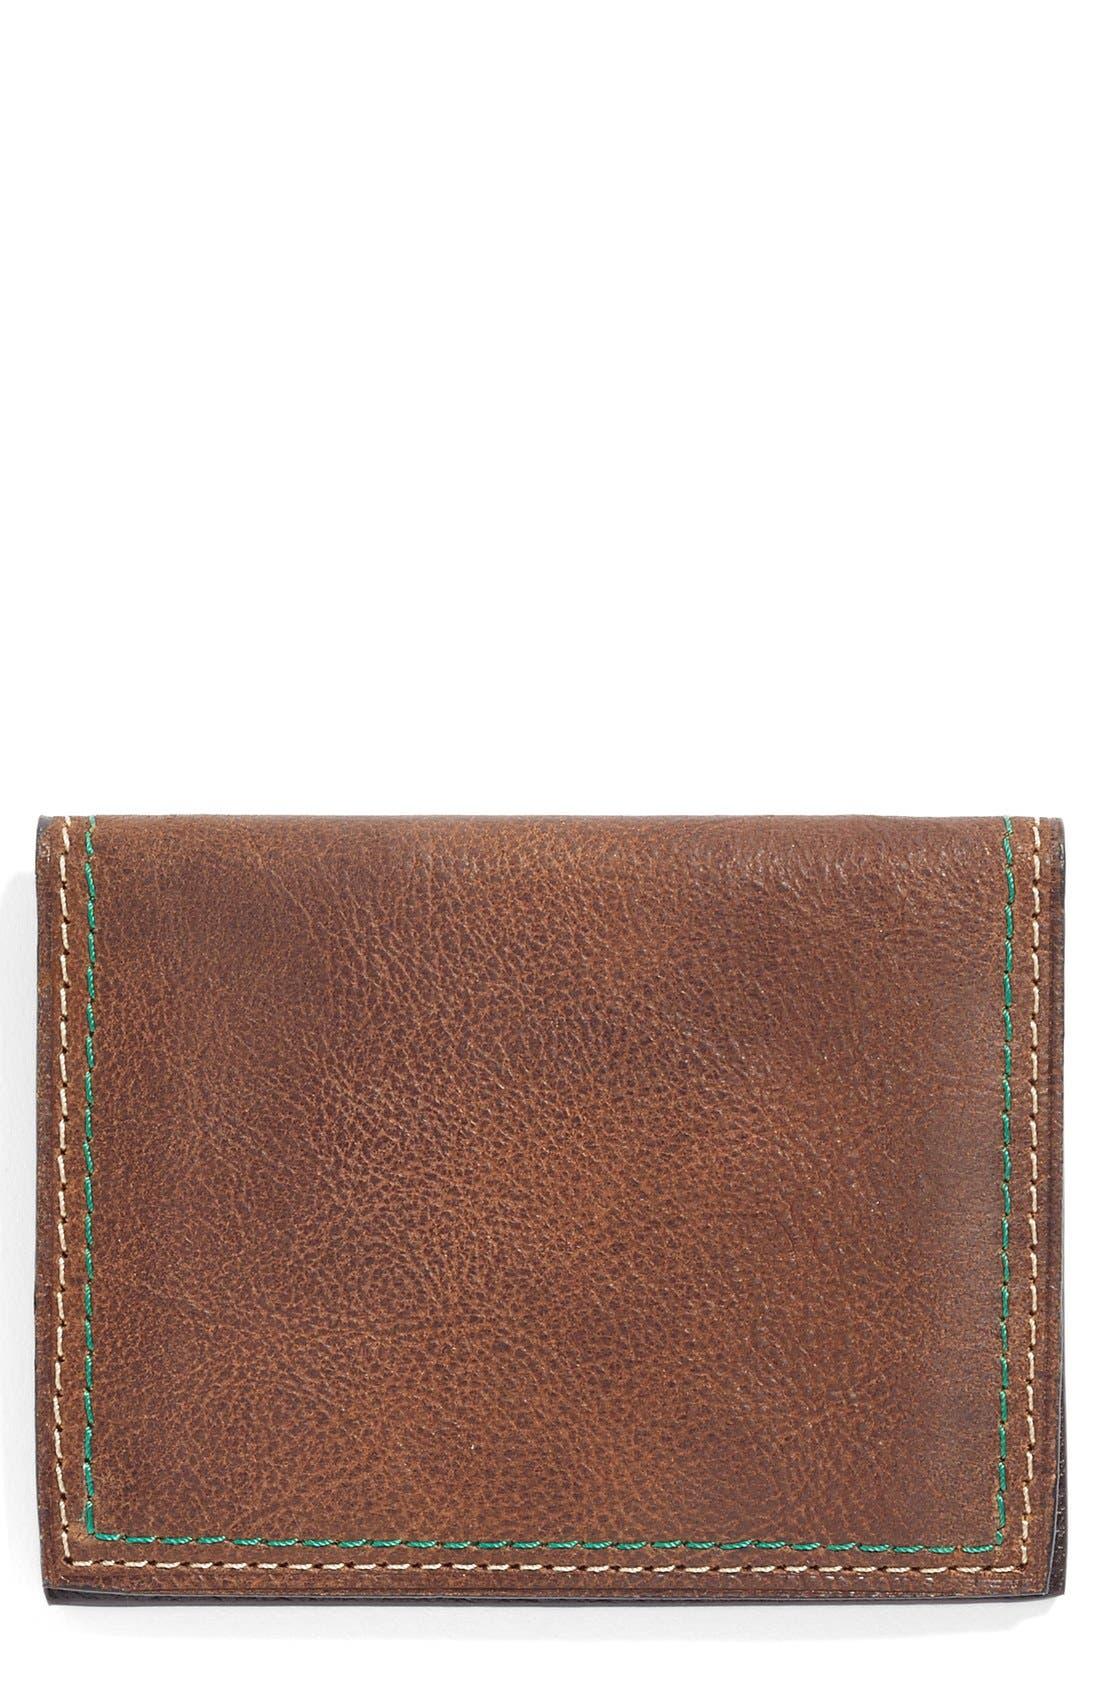 Water Buffalo Leather Card Case,                             Main thumbnail 1, color,                             200